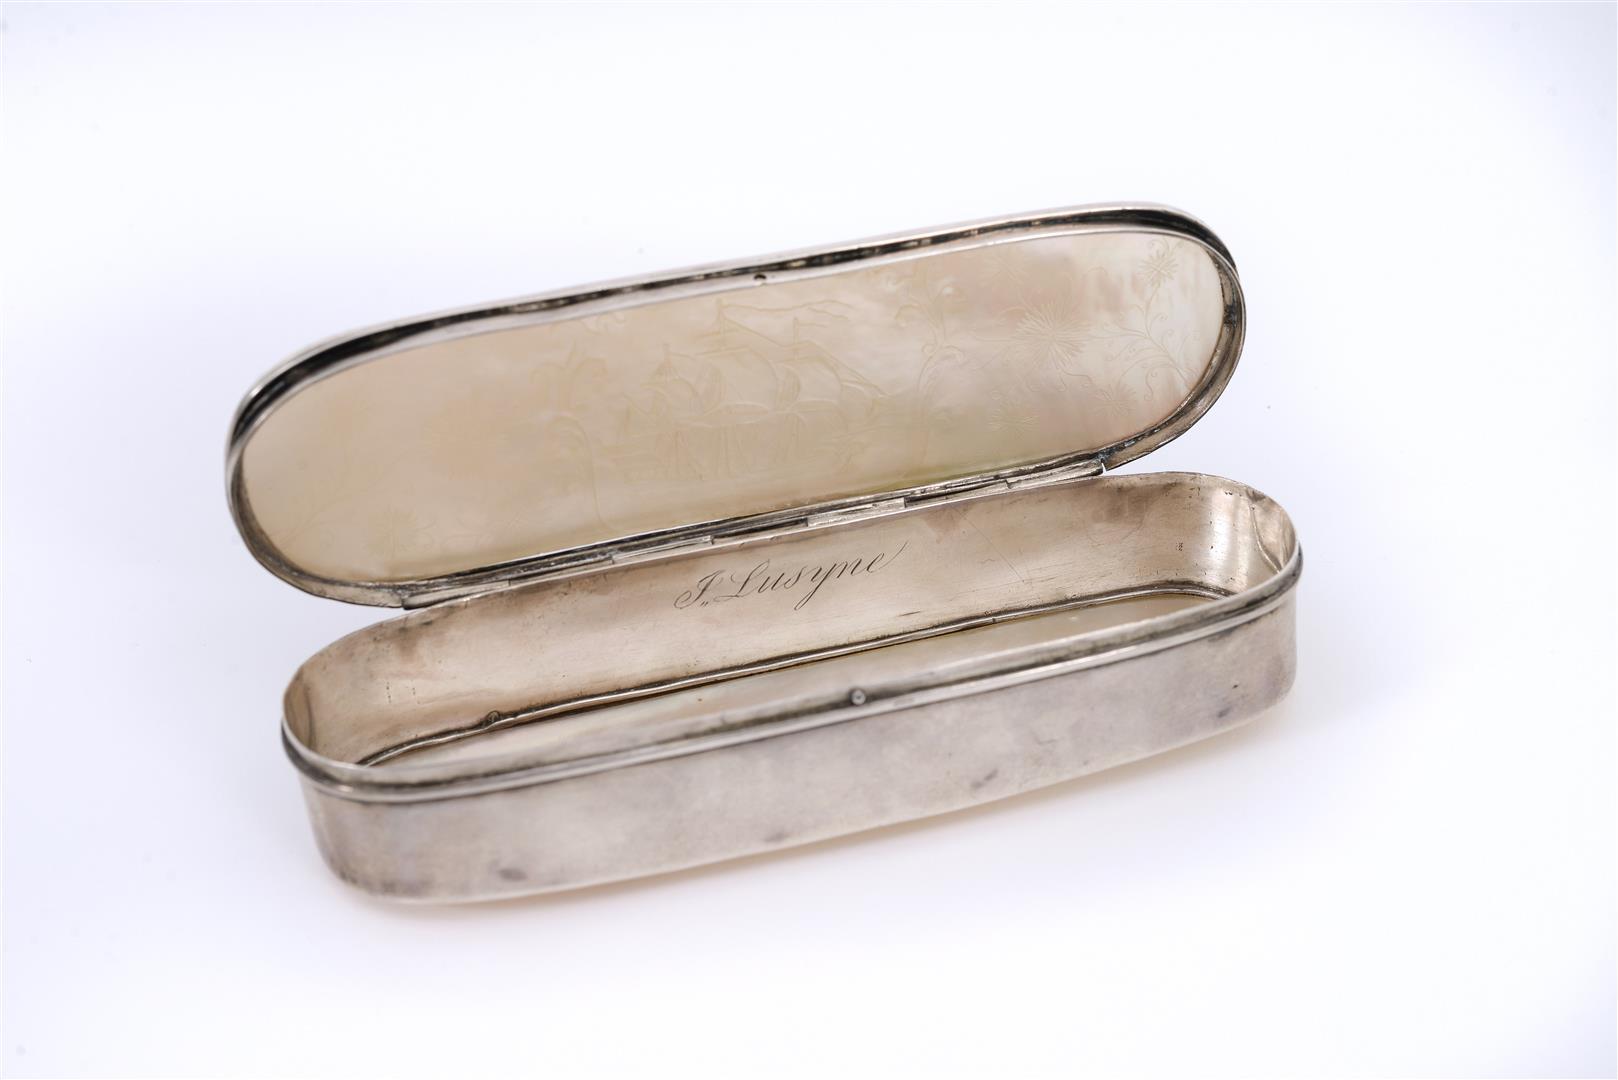 Studs silver-plated Ros\u00e9w\u00f6lkchen ros\u00e9 mother-of-pearl